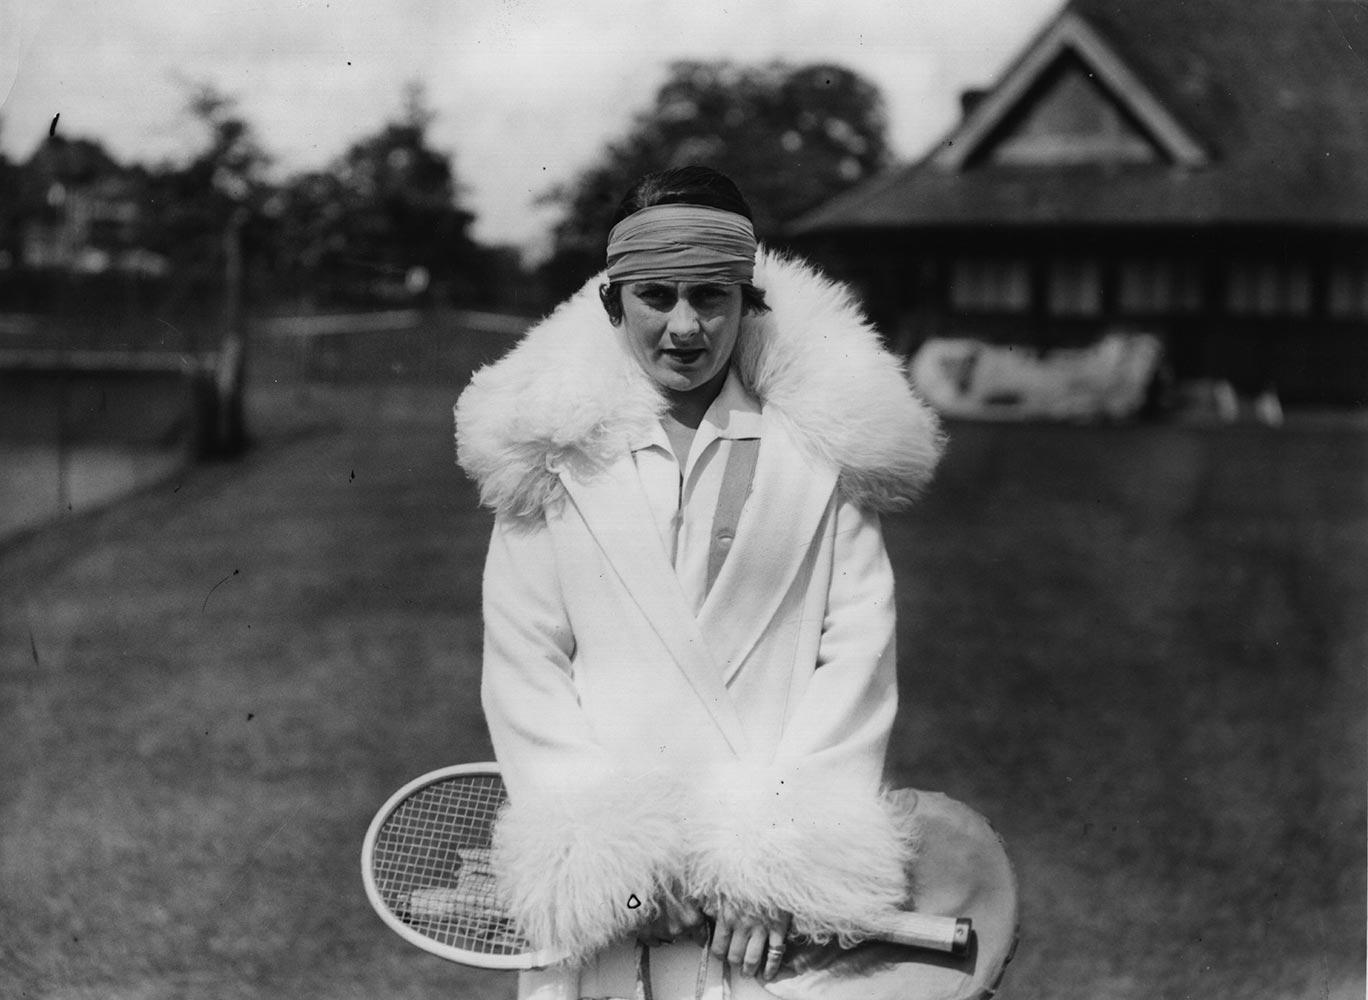 12 lili de alvarez 1926 - wimbledon fashion icons